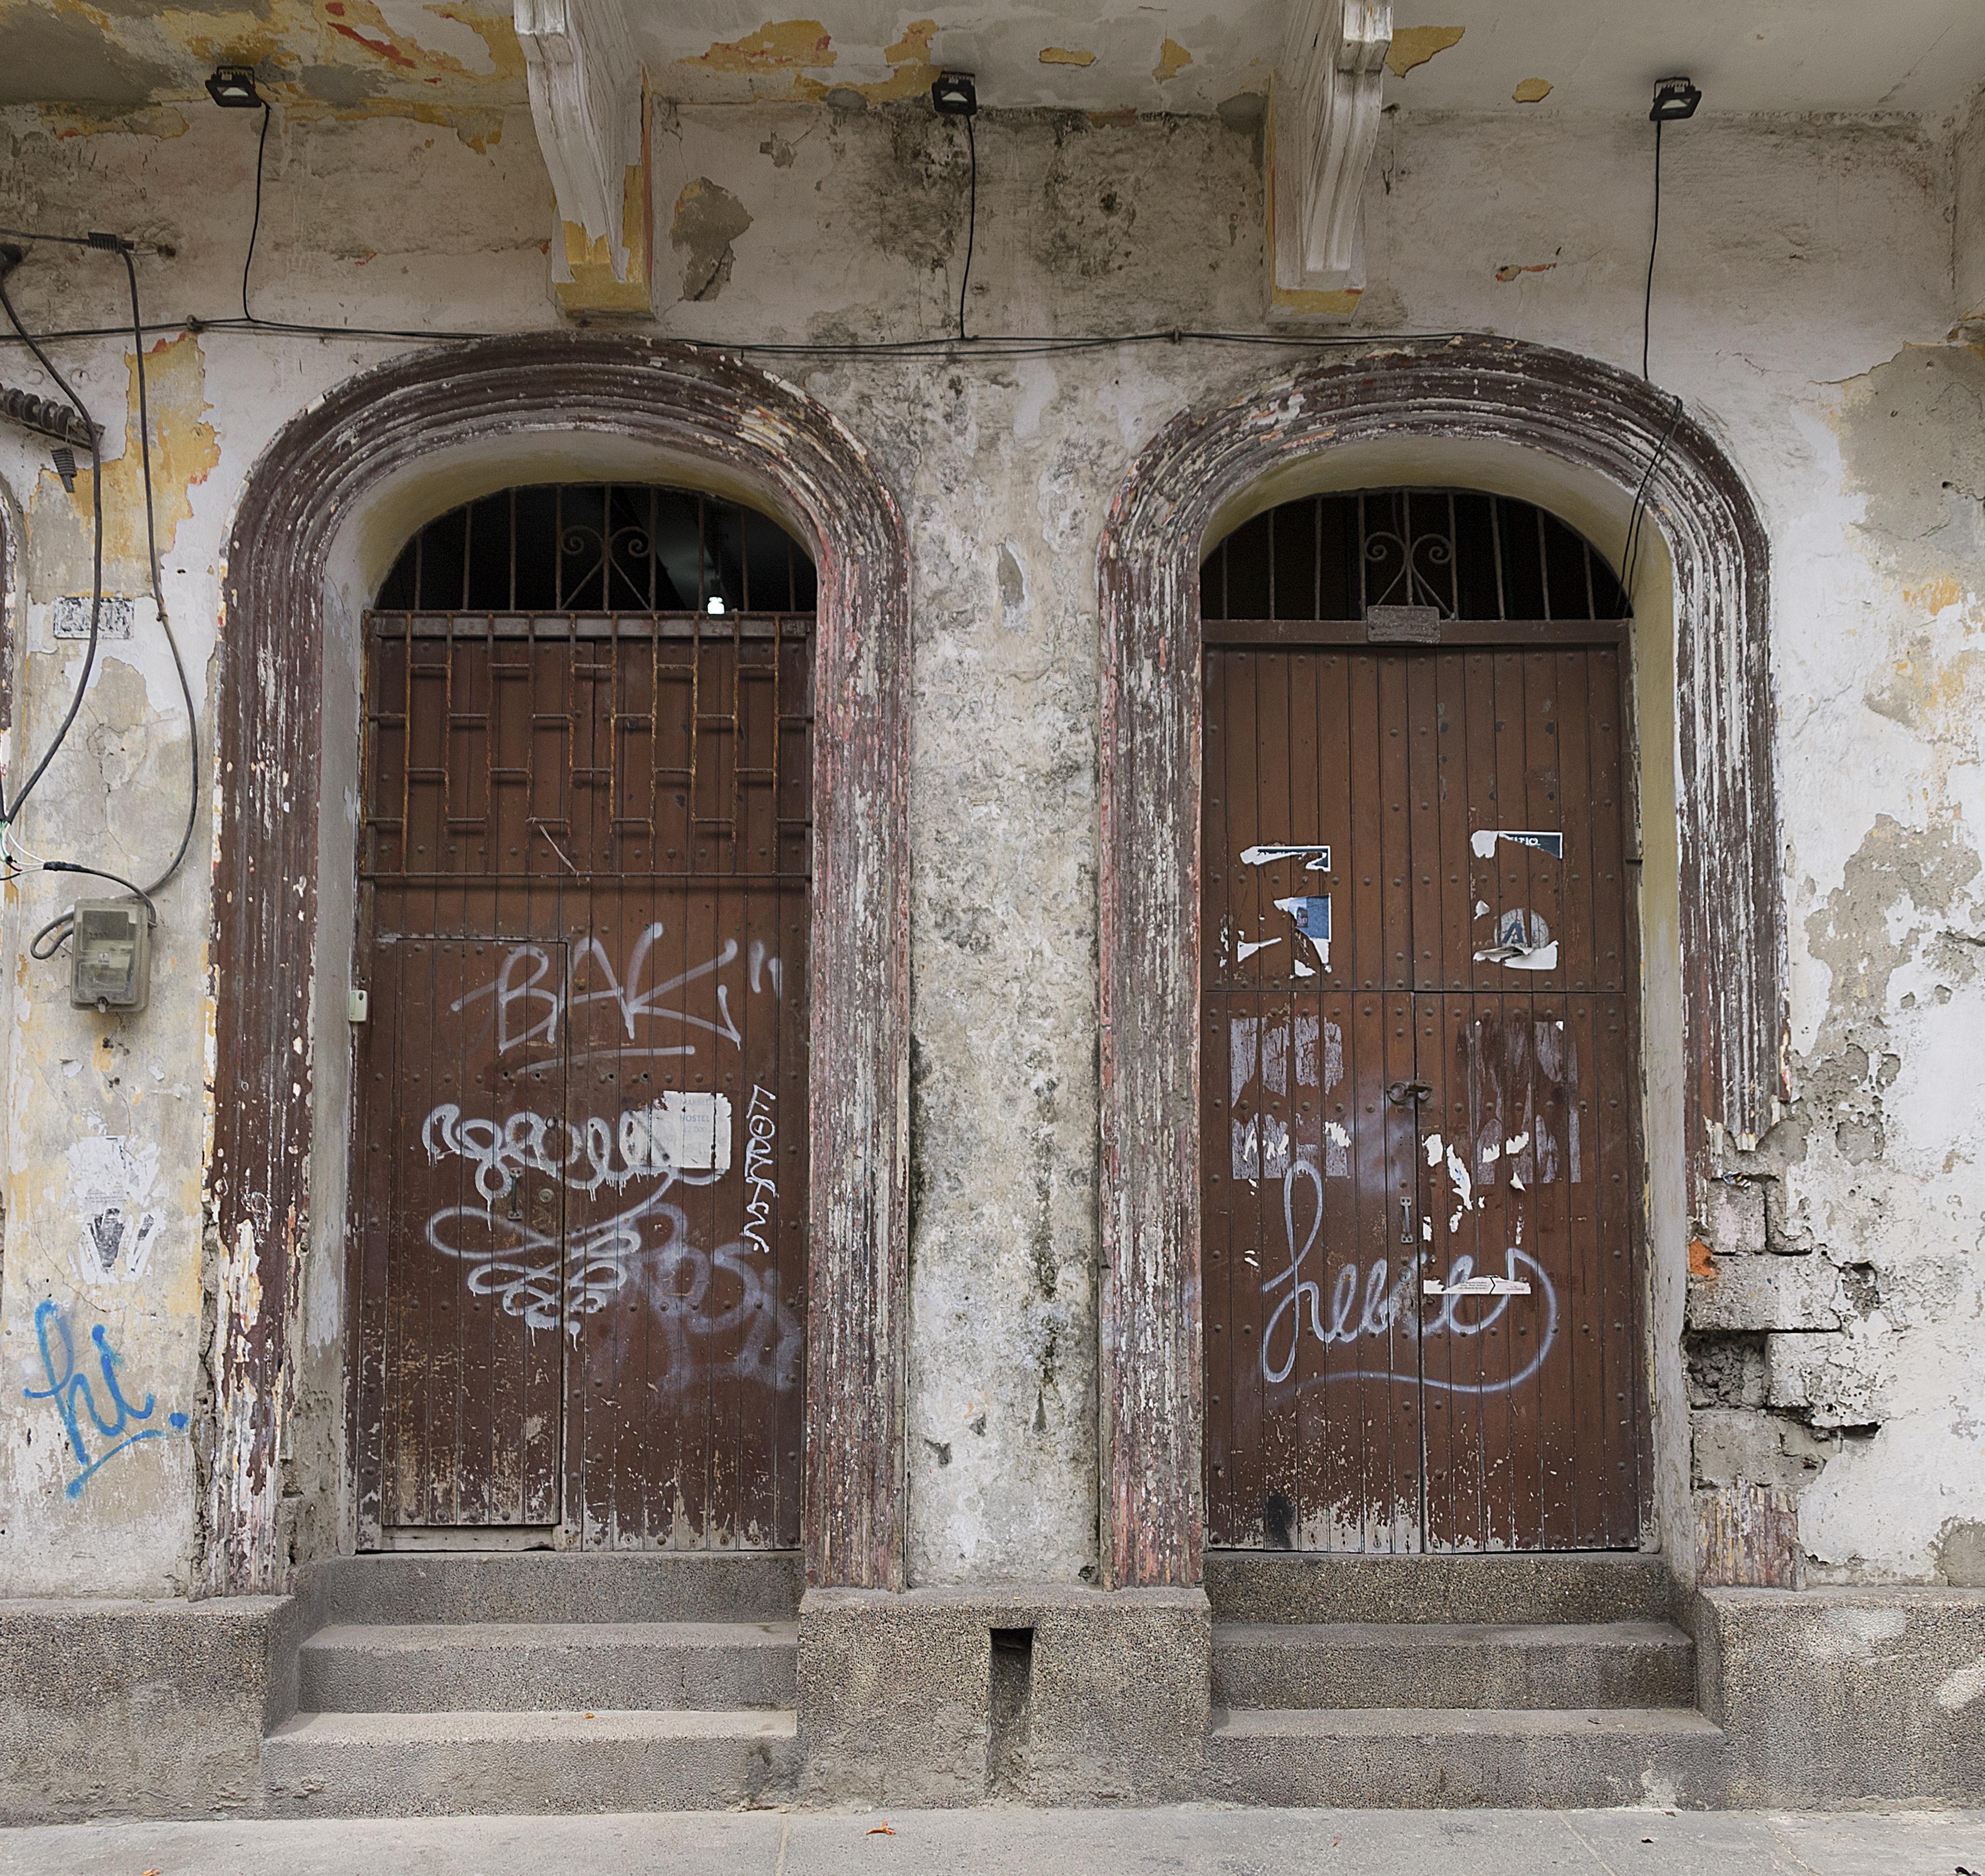 Free Images Architecture Street Window Town Building Old City Wall Arch Facade Grunge Historic Graffiti Door Art Vandalism Doors Latin